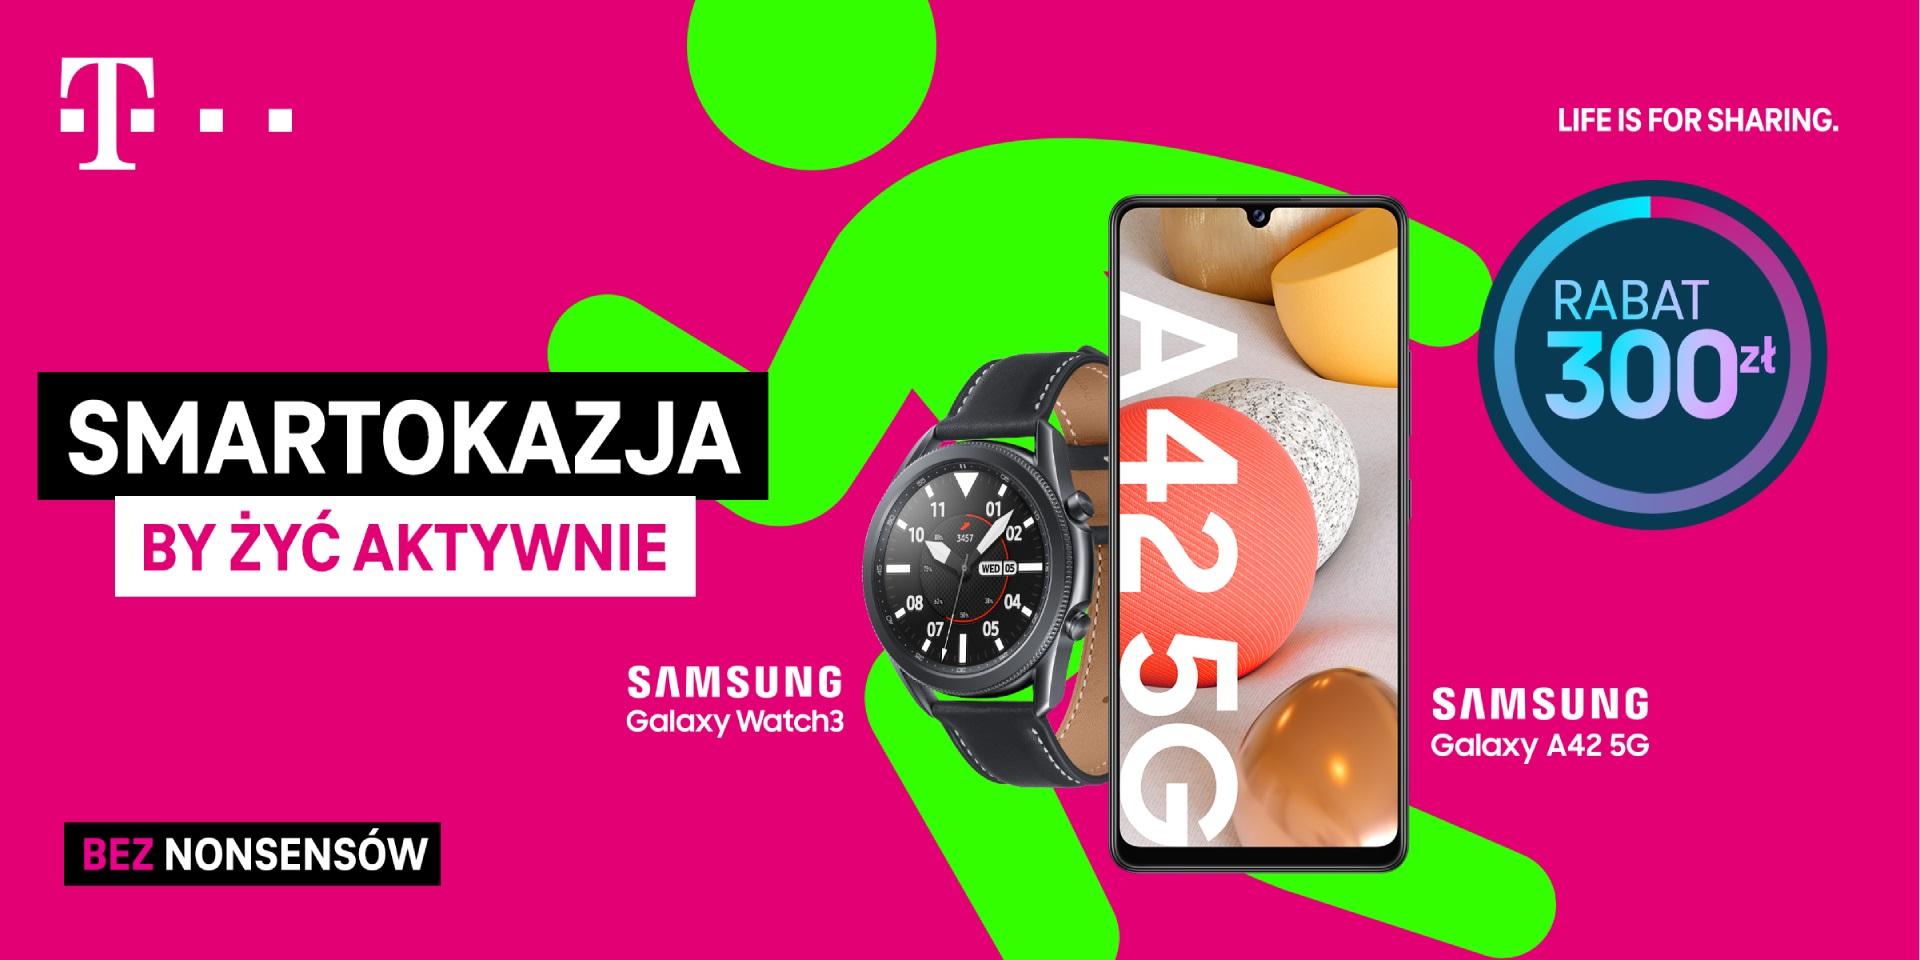 Smartokazje T-Mobile Samsung Galaxy A42 5G Galaxy Watch 3 LTE